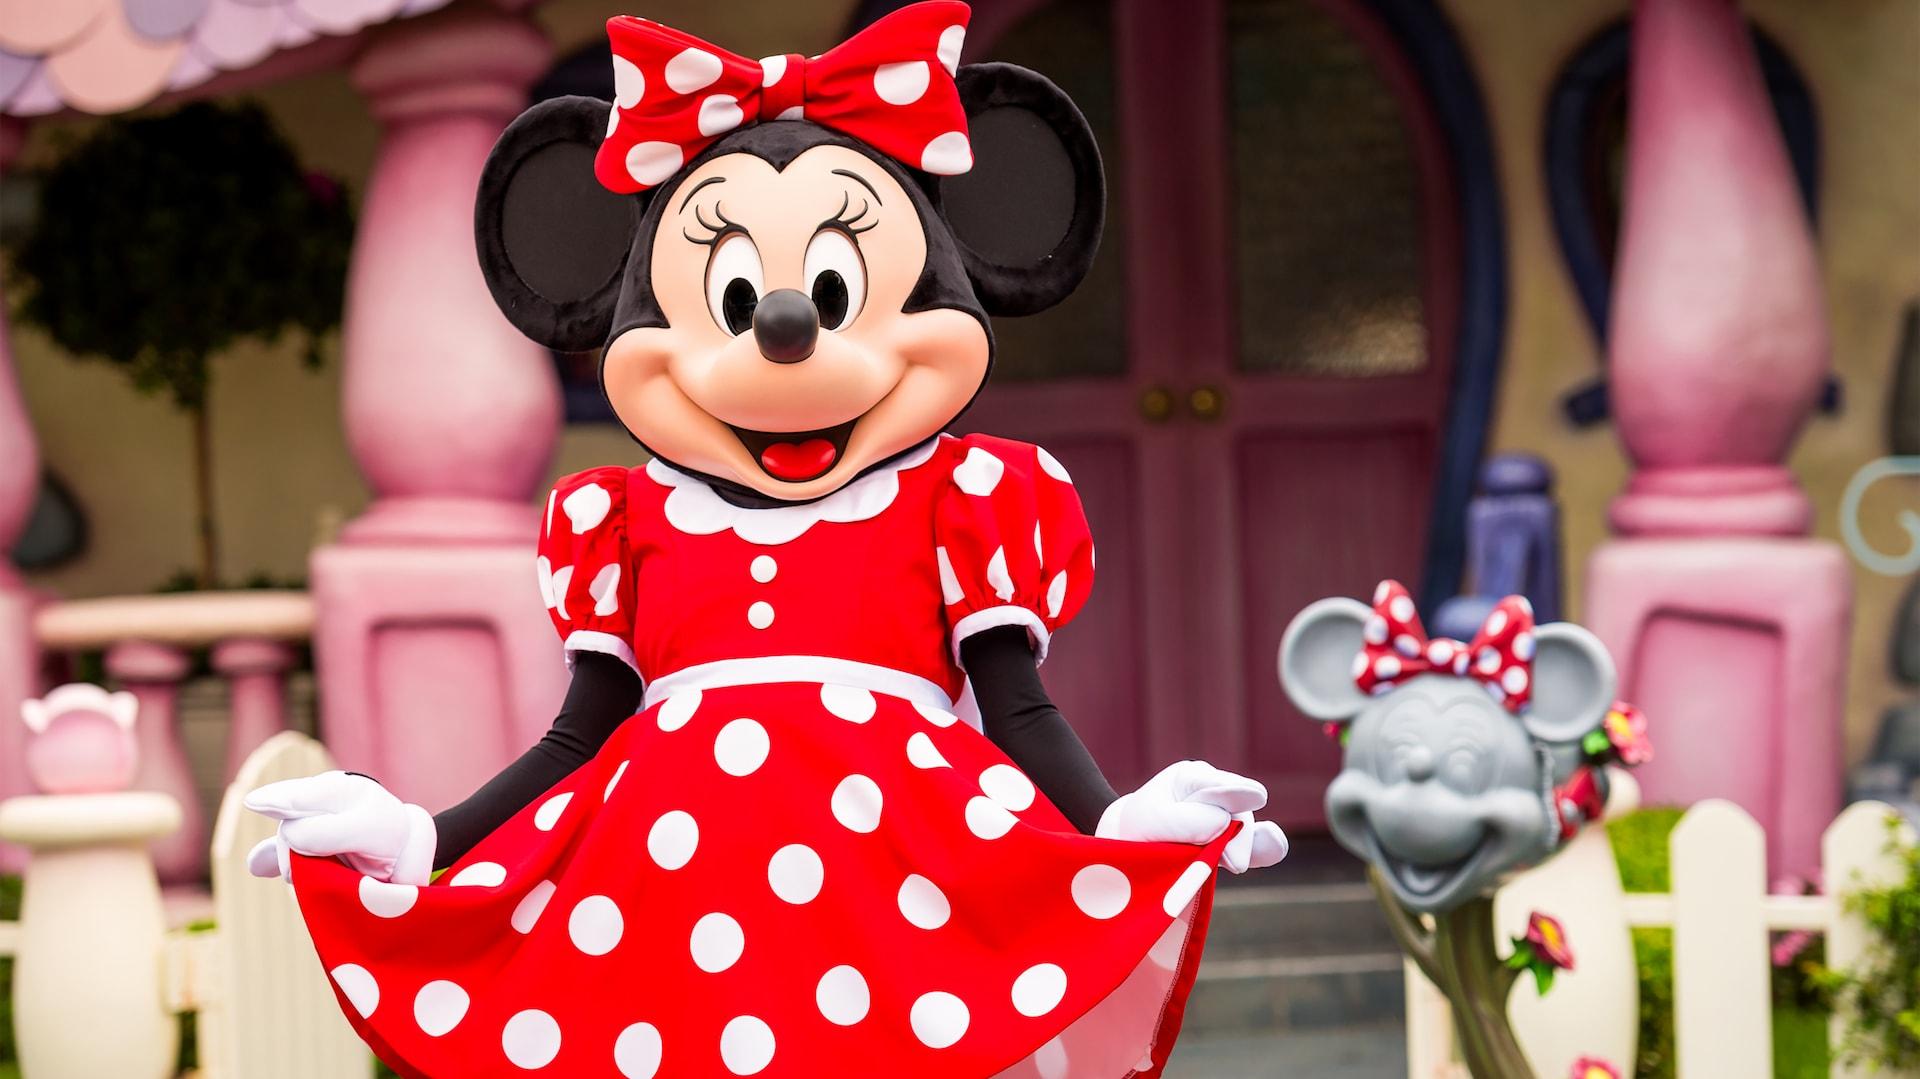 Minnie S House Rides Attractions Disneyland Park